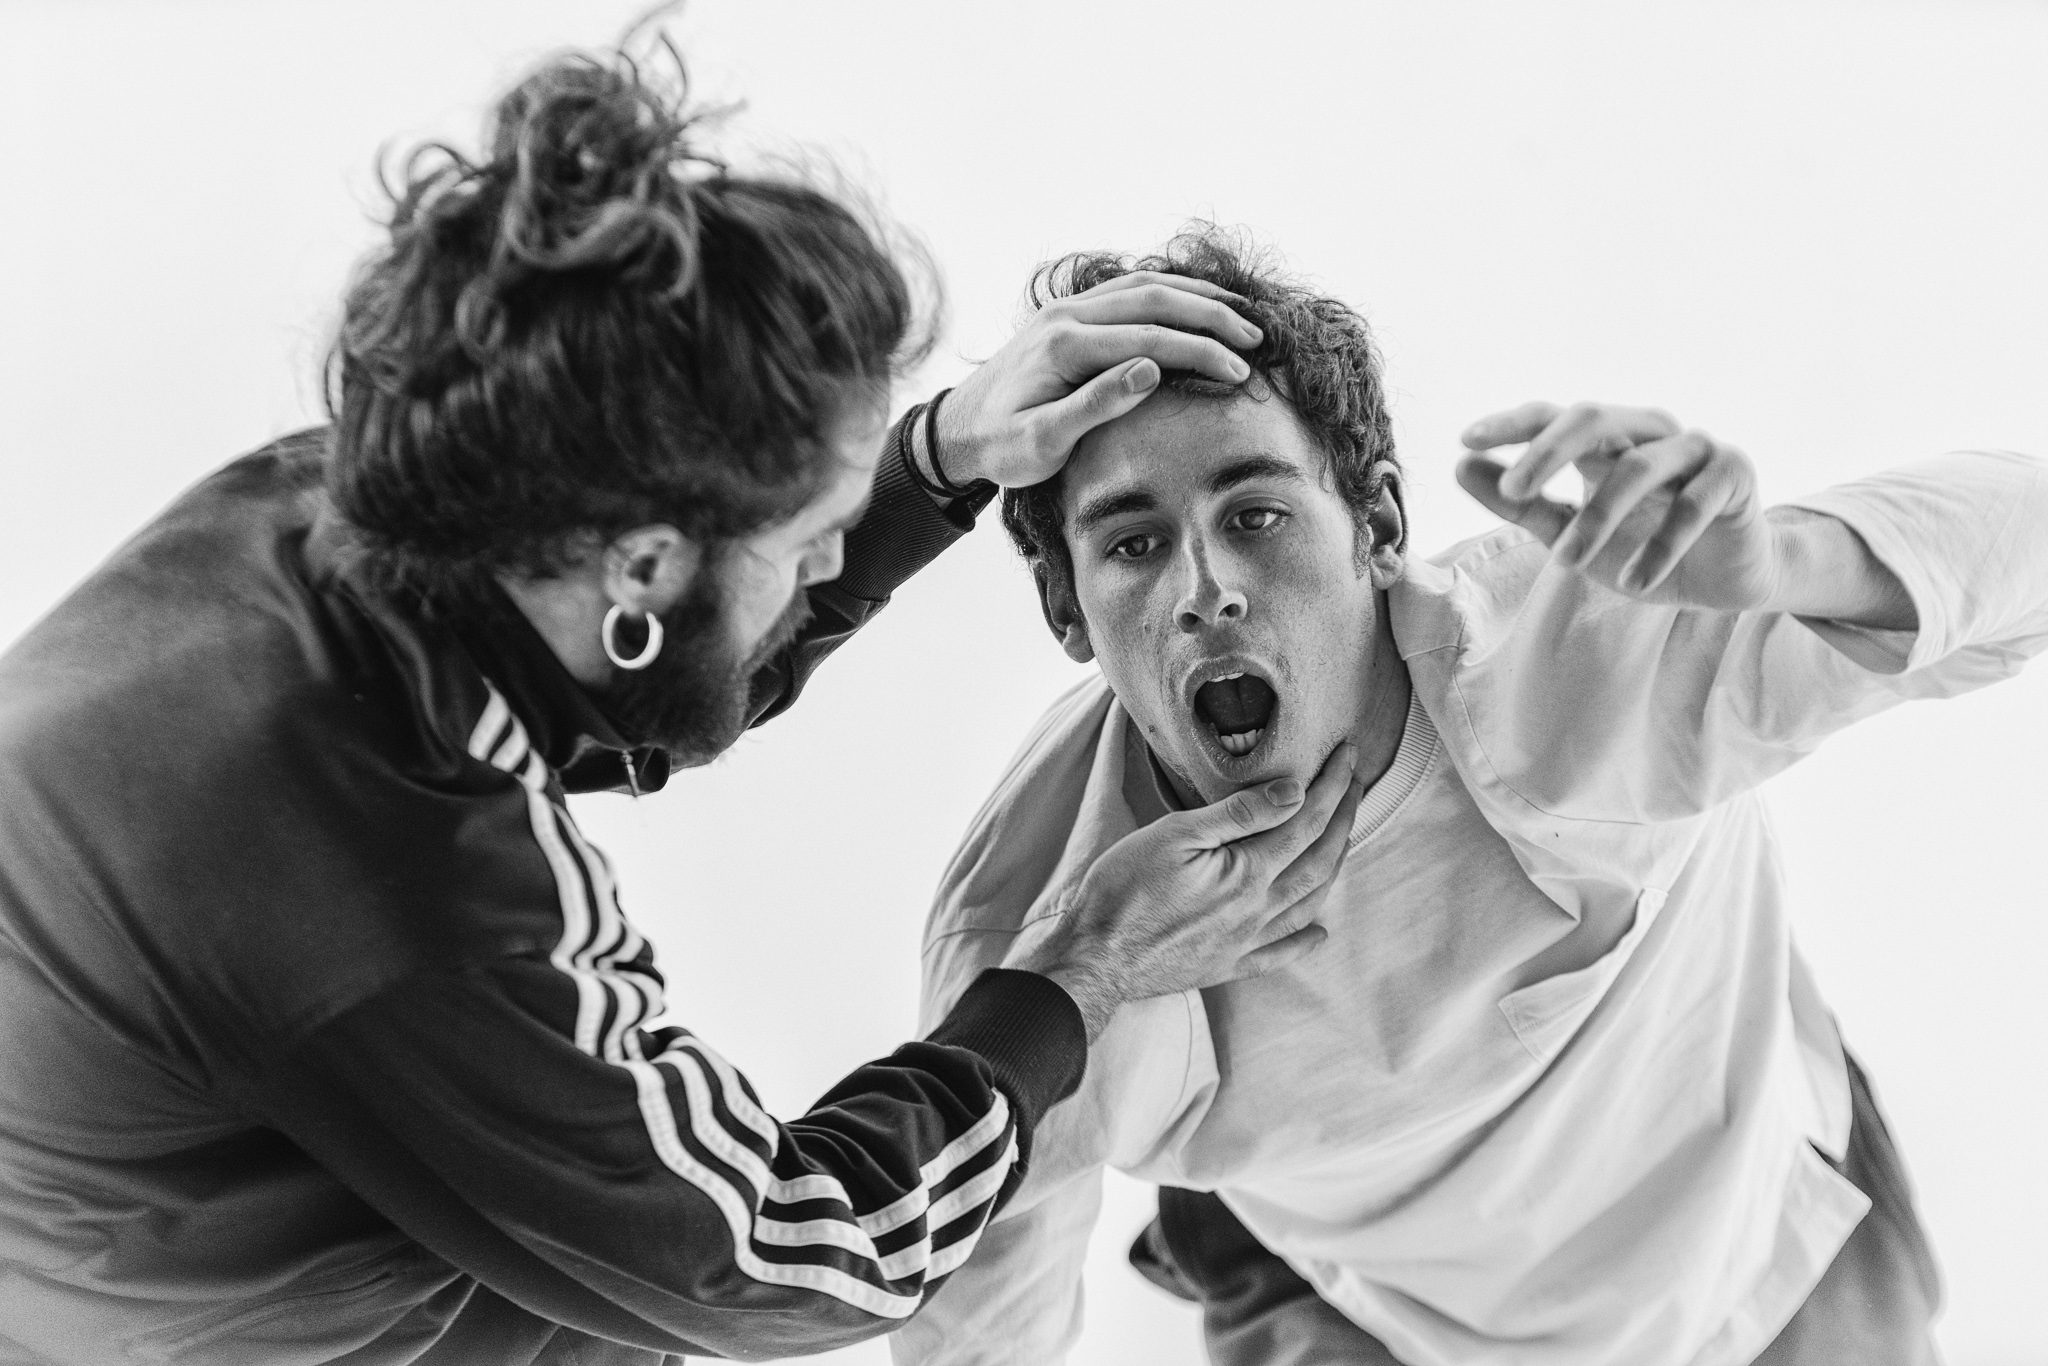 Image of rehearsal of James Finnemore Foxing dance photography, fotografía de ensayo, fotografo de danza, dance photographer, rehearsal photography